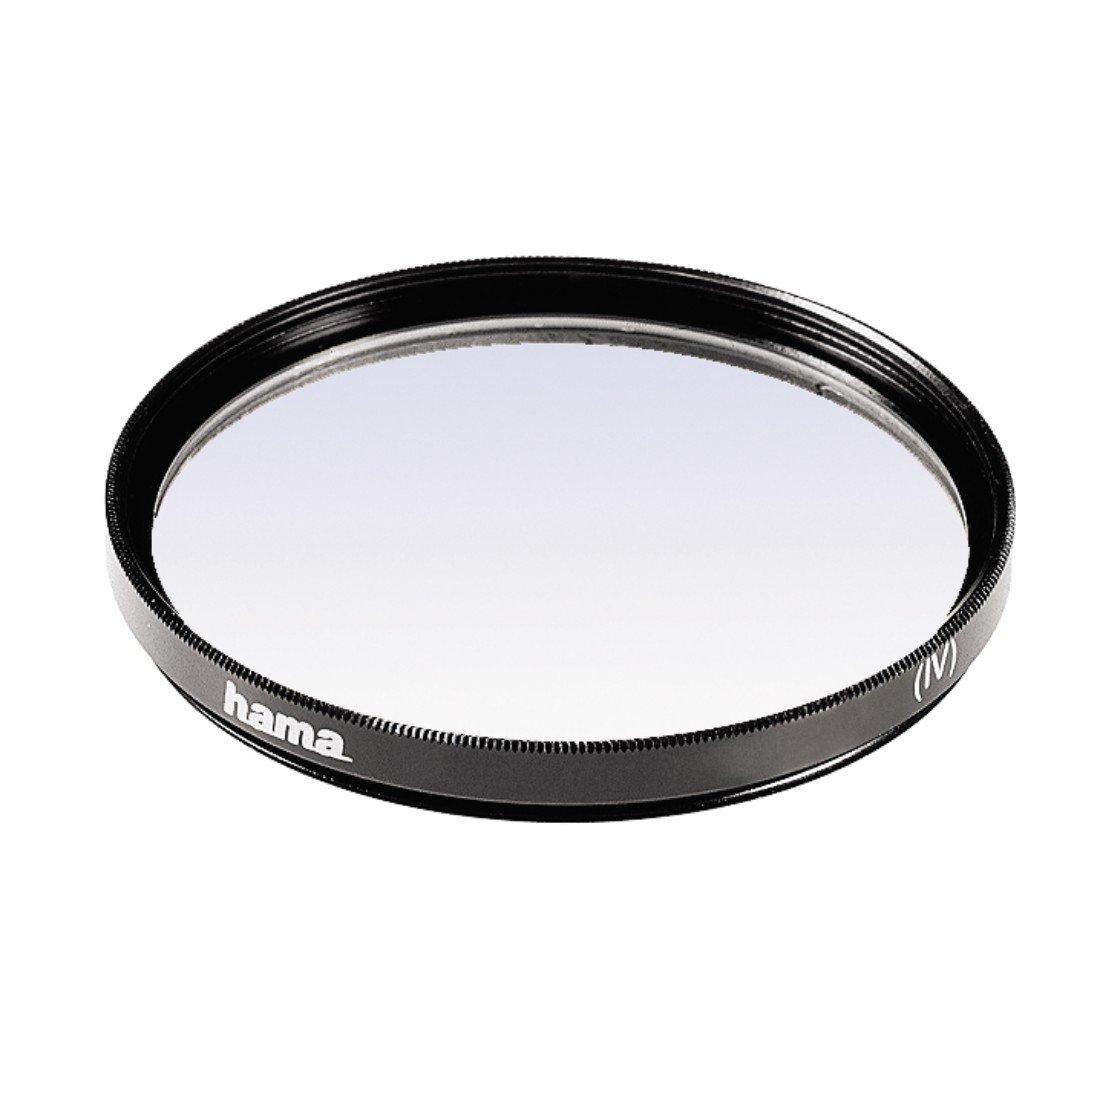 Hama 070037 - Filtro ultravioleta, 37 mm, color neutro 00070037